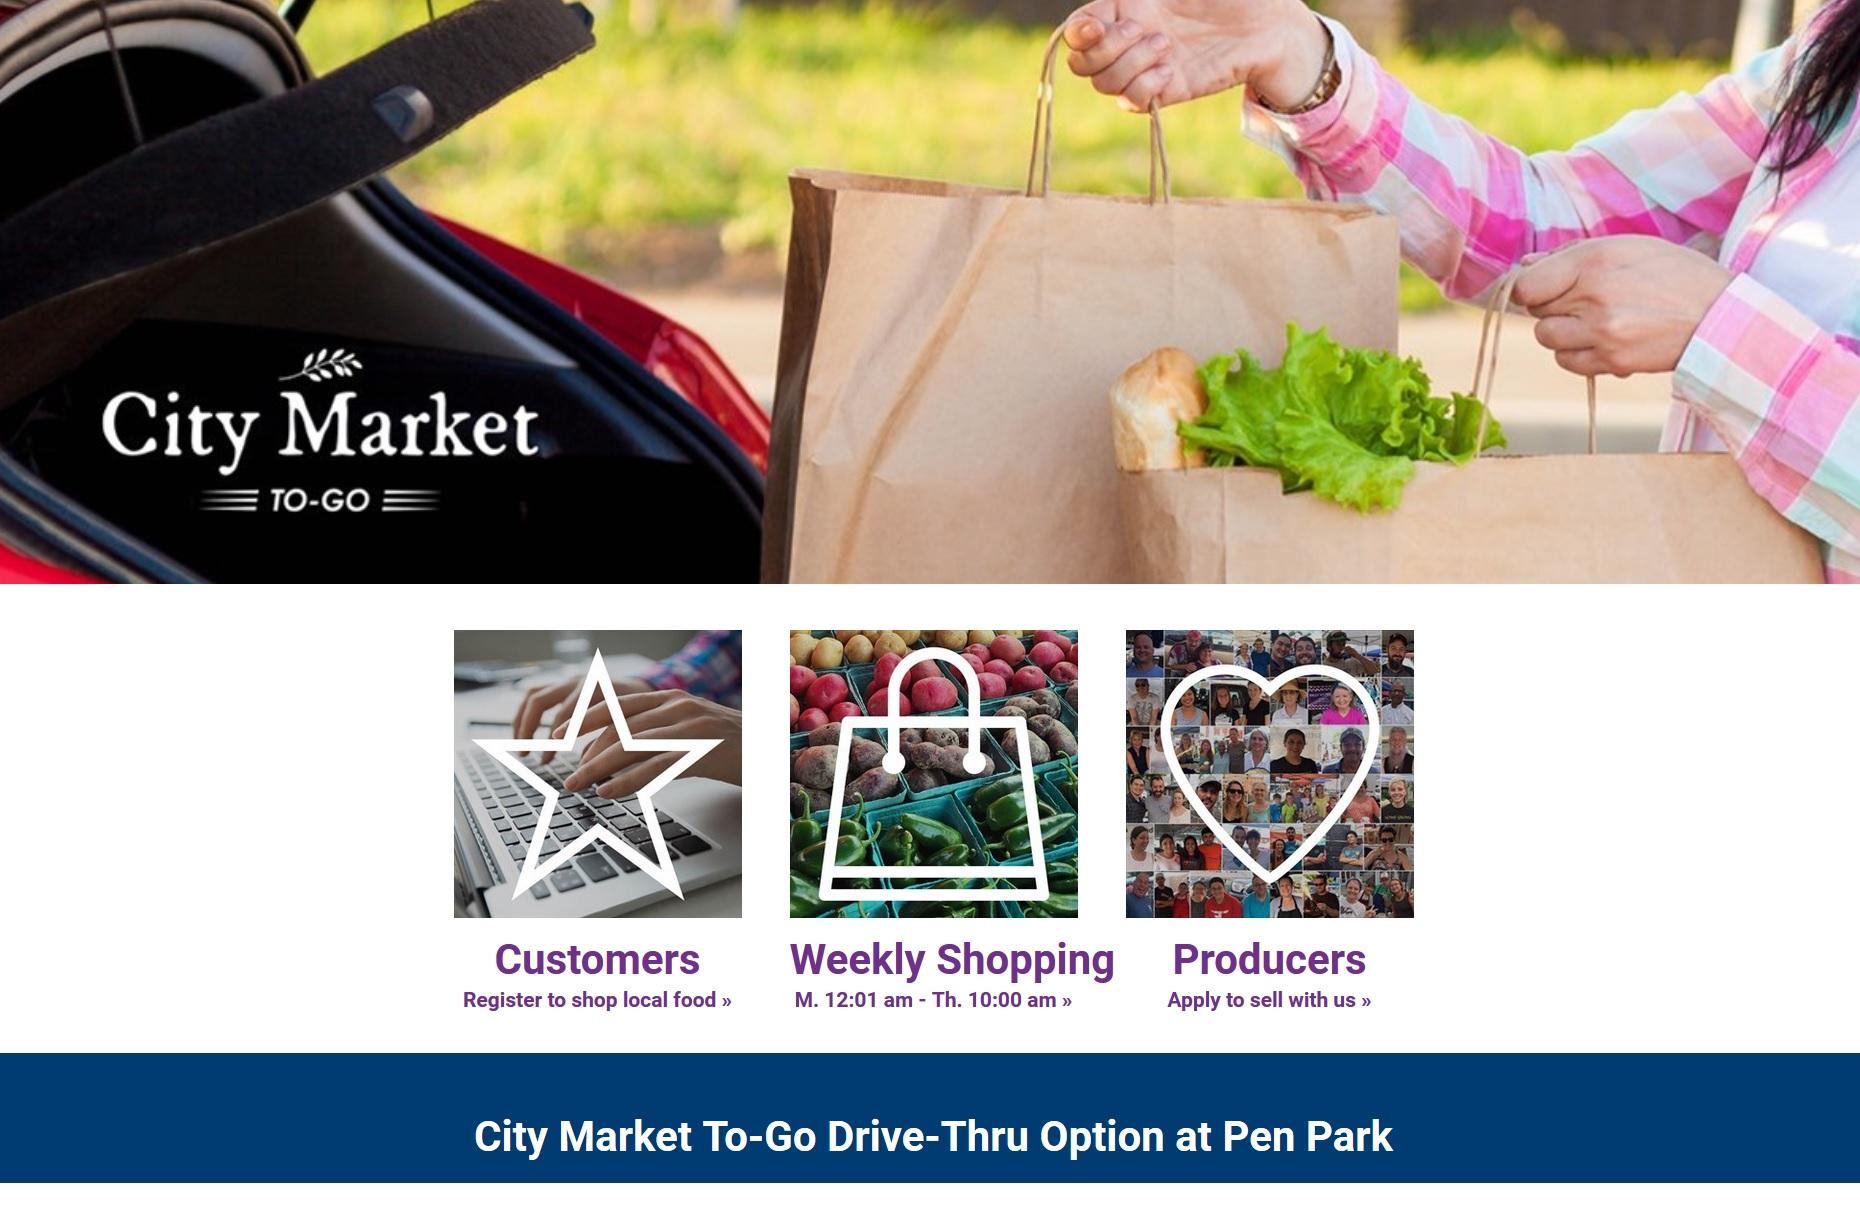 Charlottesville City Market To-Go